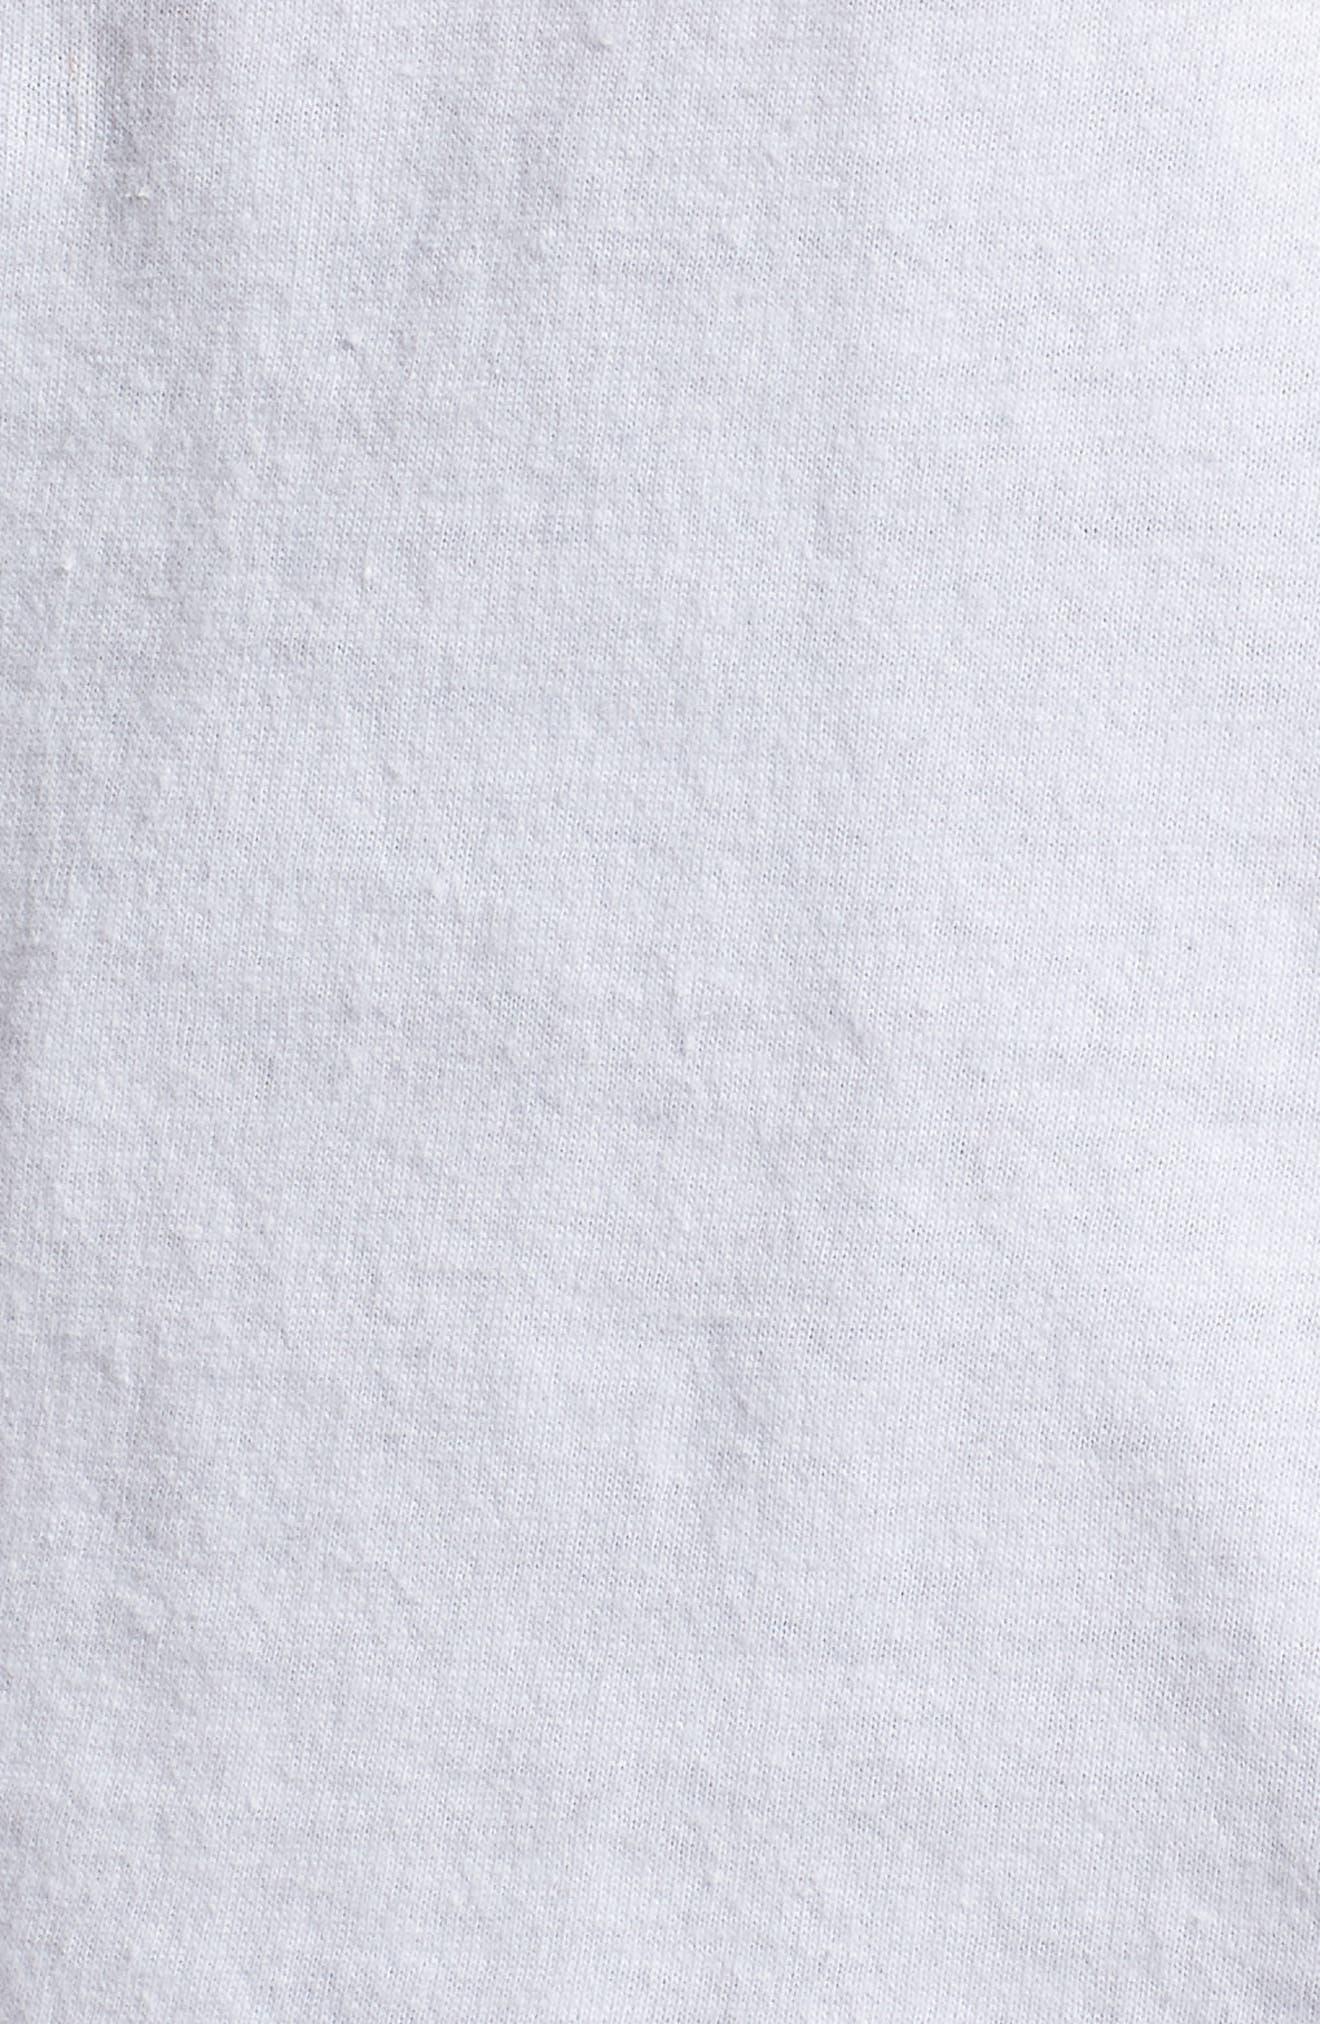 Aaliyah T-Shirt,                             Alternate thumbnail 5, color,                             White Tee Aaliyah